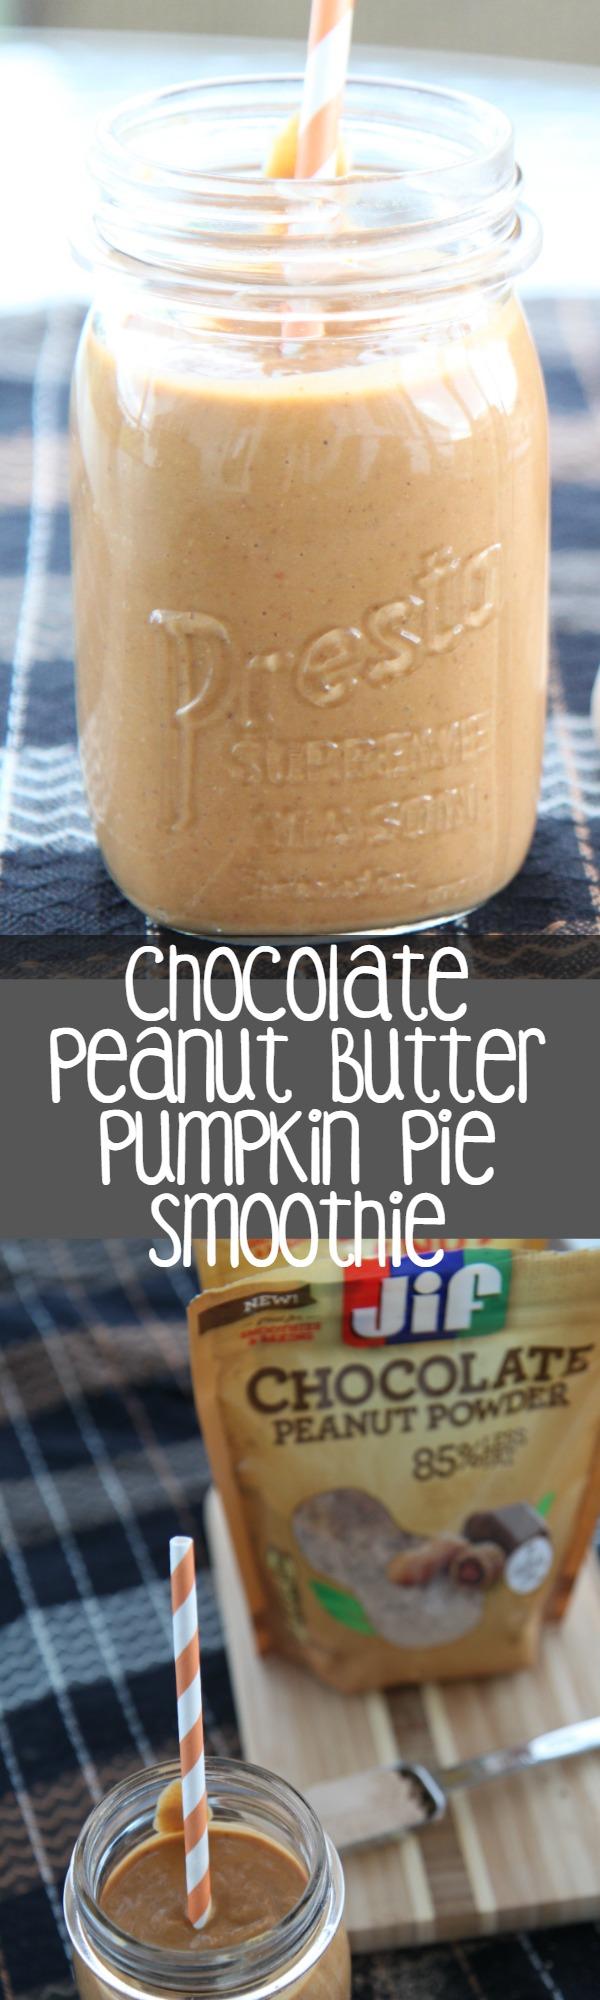 Pumpkin Pie Smoothie with Peanut Butter Chocolate